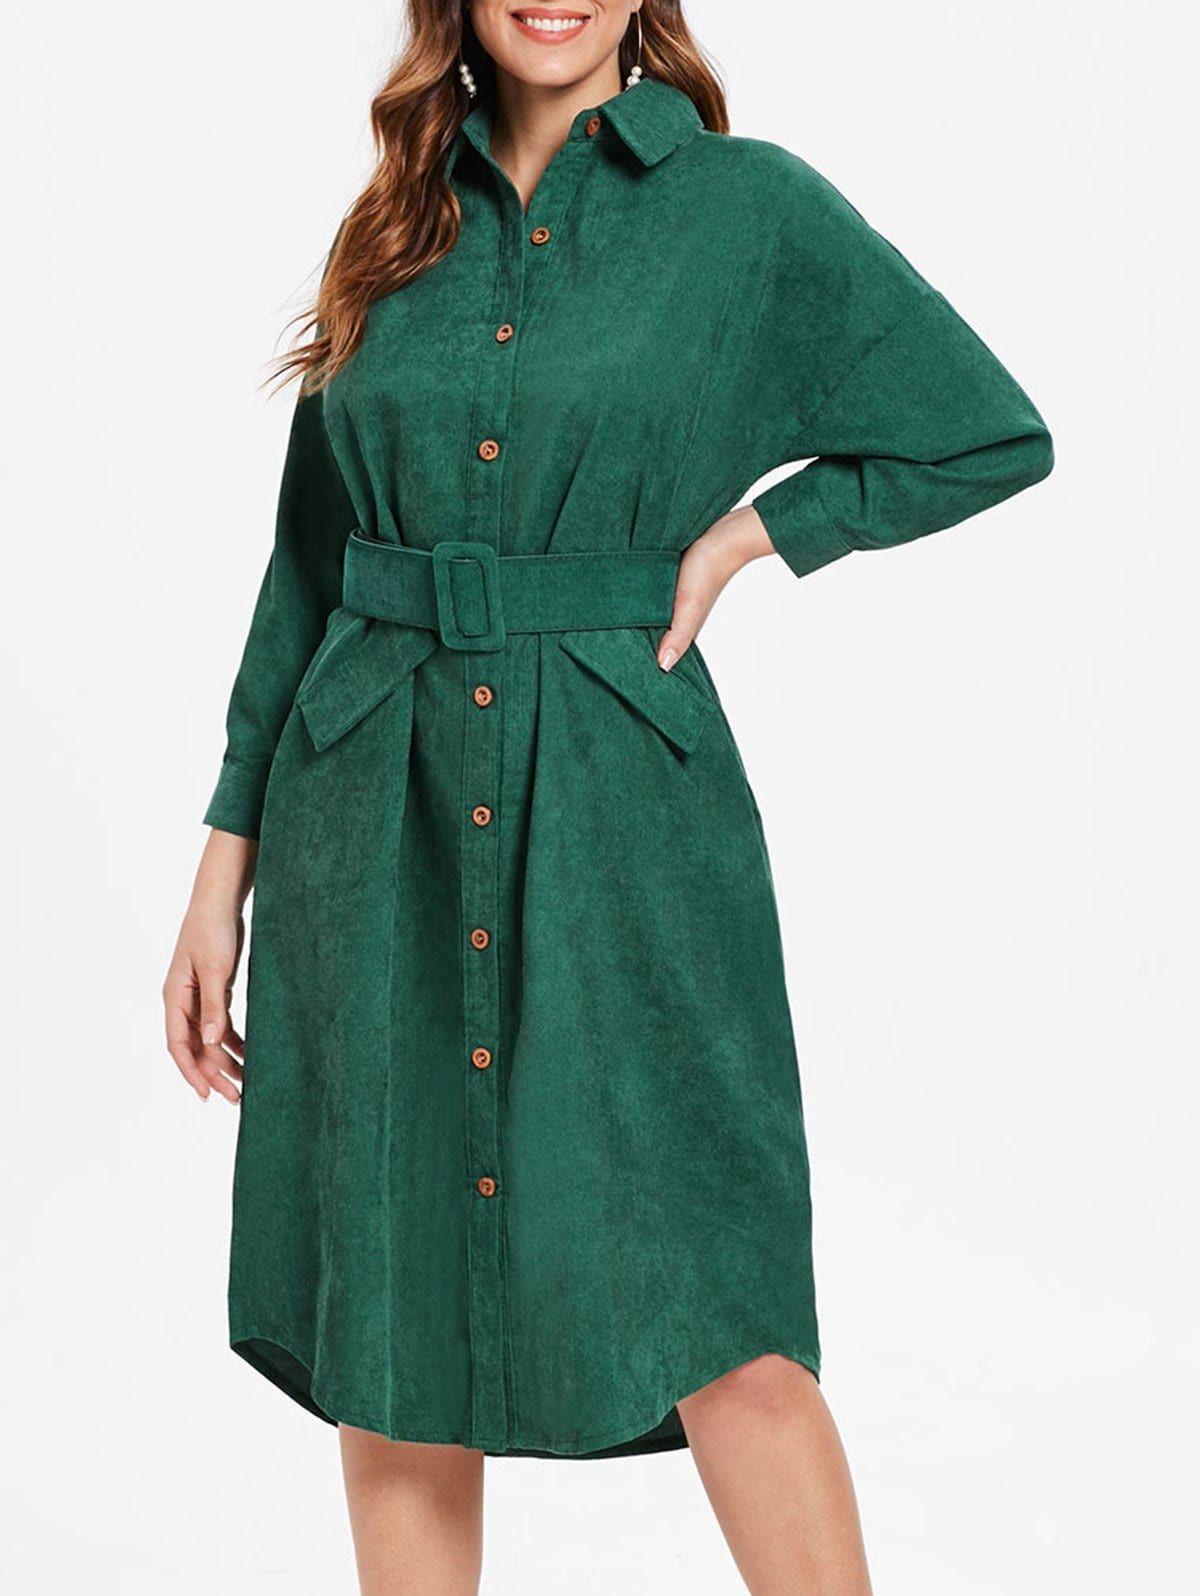 Cuff Sleeve Belted Corduroy Dress Corduroy Dress Maxi Dress Outfit Fall Trendy Fashion Women [ 1596 x 1200 Pixel ]